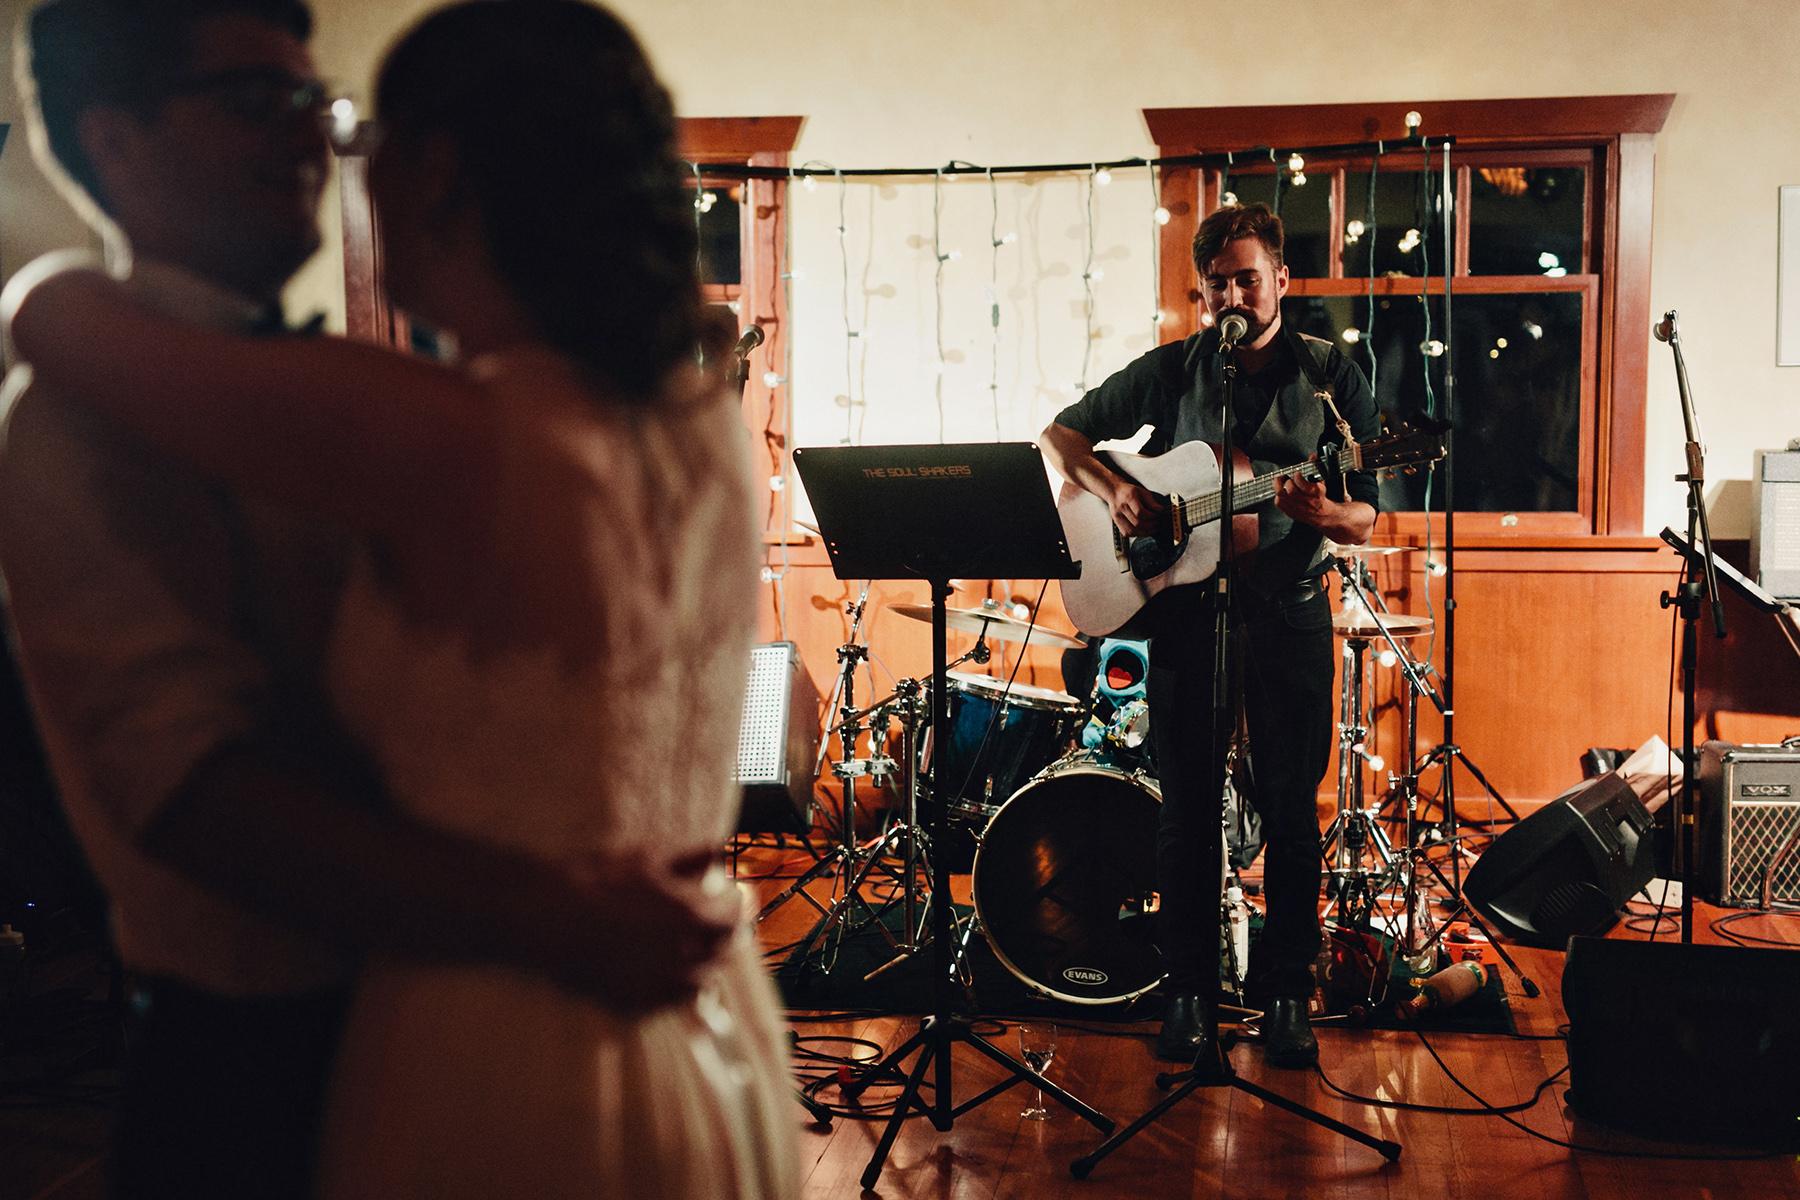 chelsea-brian-wedding-photos-0044.jpg